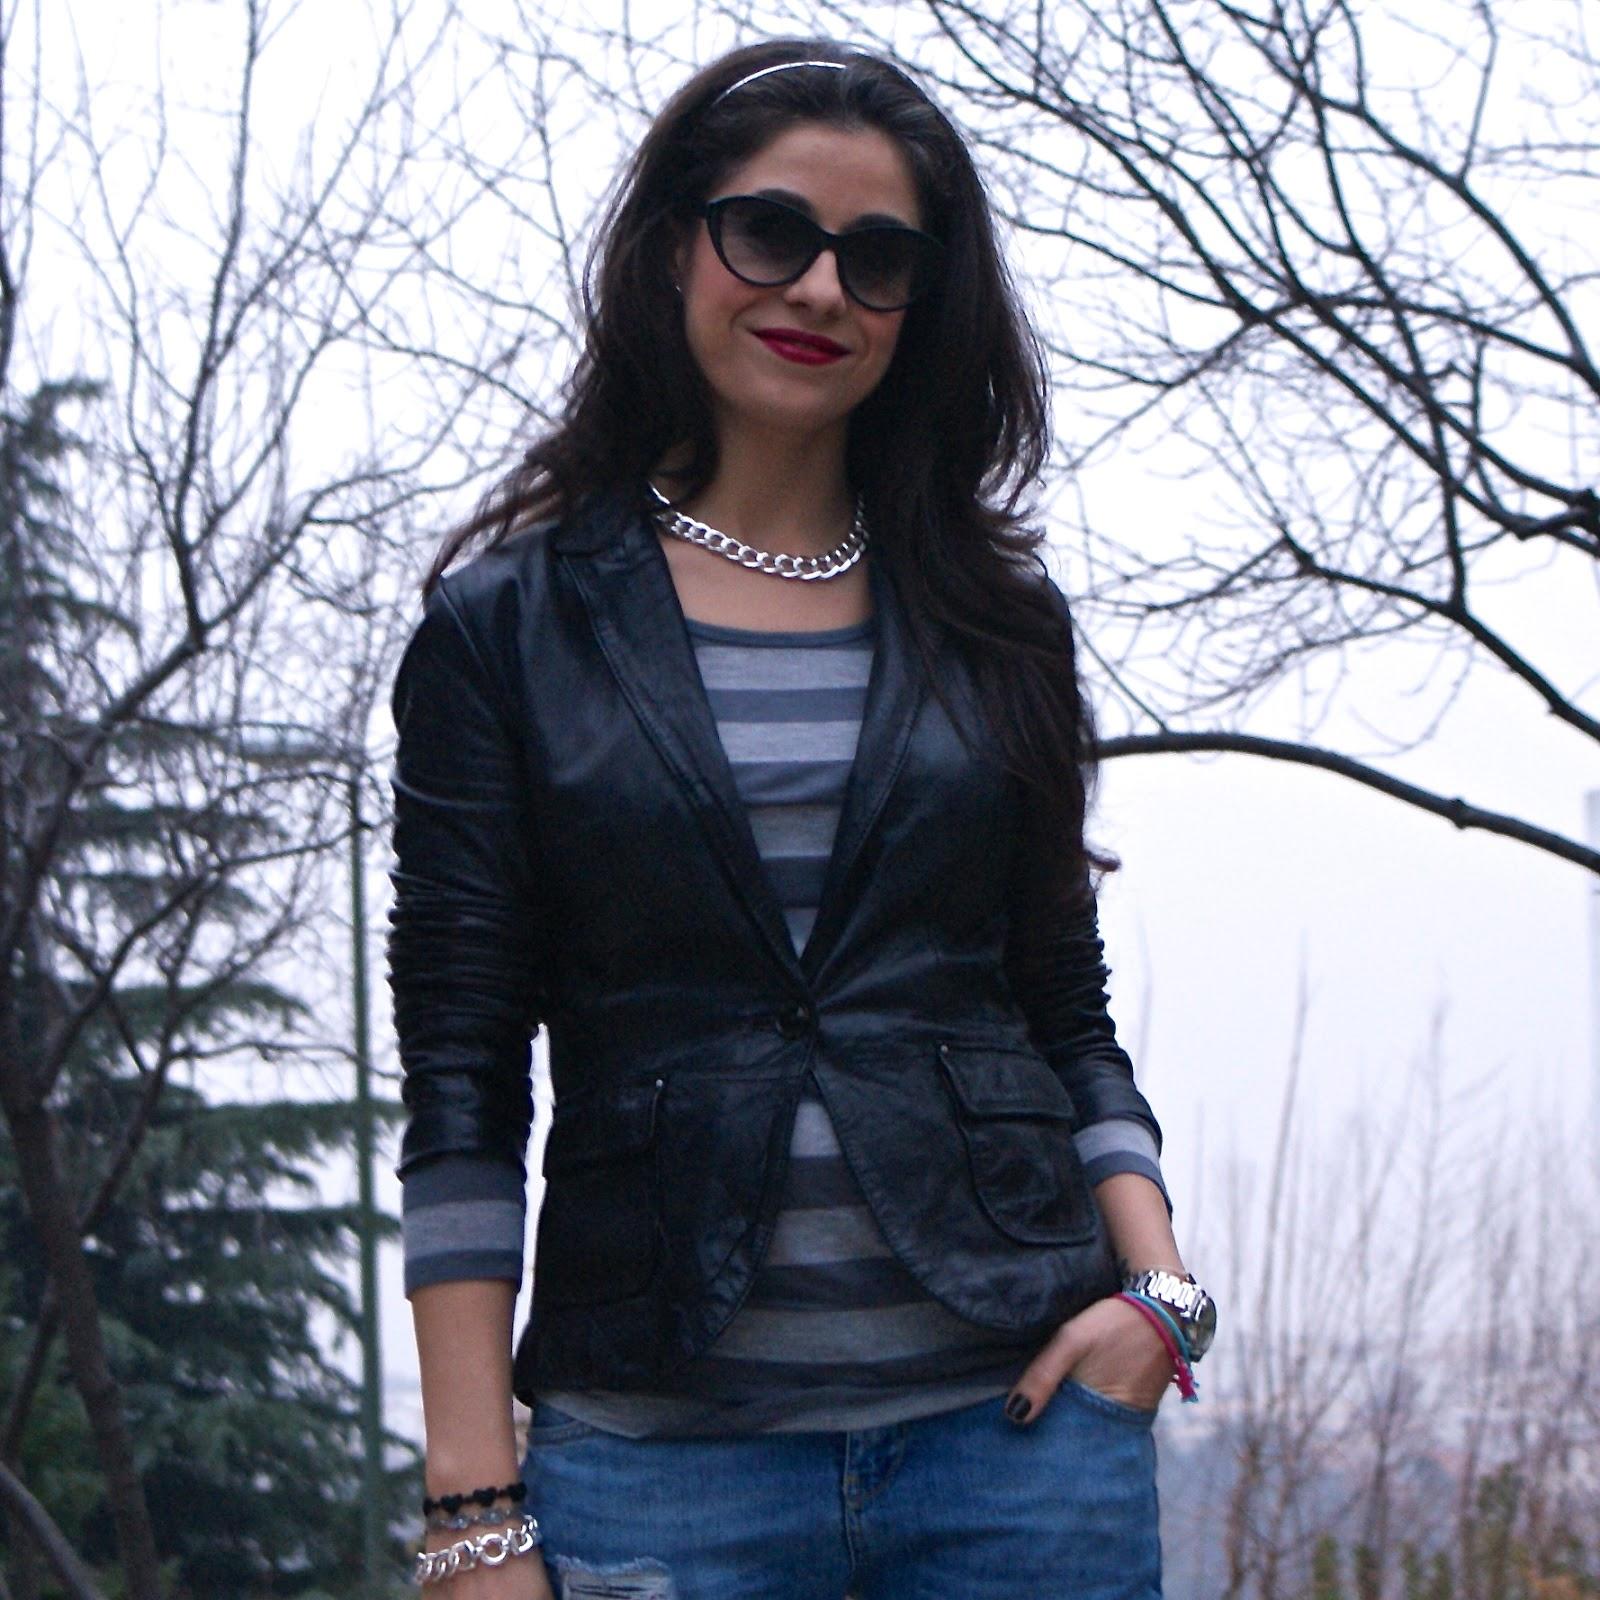 LaCaprichossa-StreetStyle-Fashion Blogger-Boyfriend jeans-leather blazer-look-bolso roberto verino-cadenas-pulsera yanes young